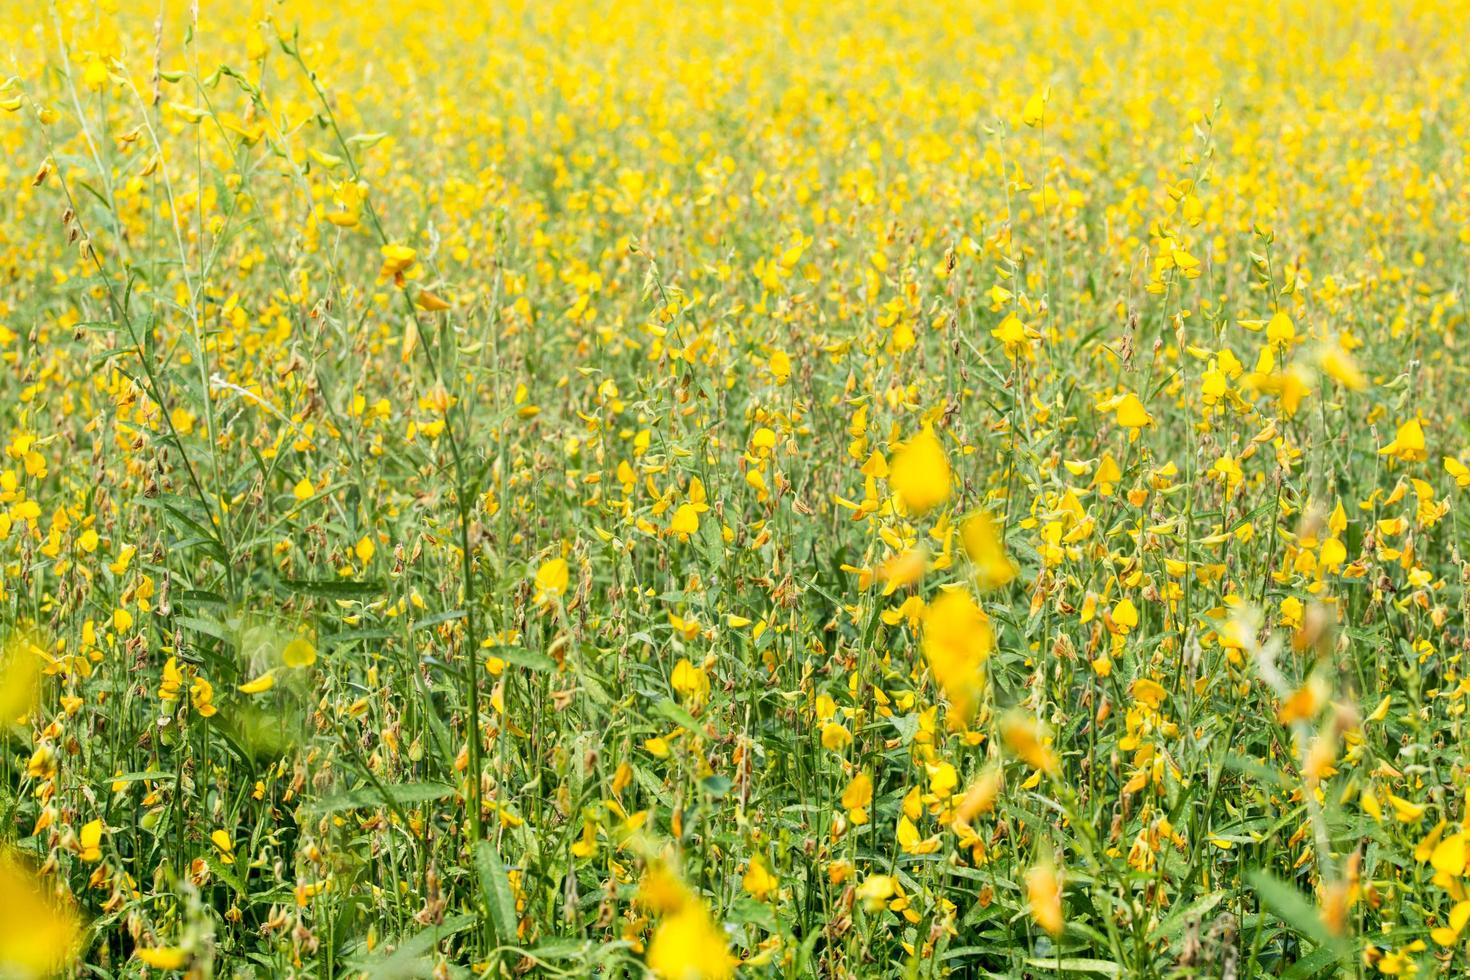 flores de crotalaria chachoengsao foto